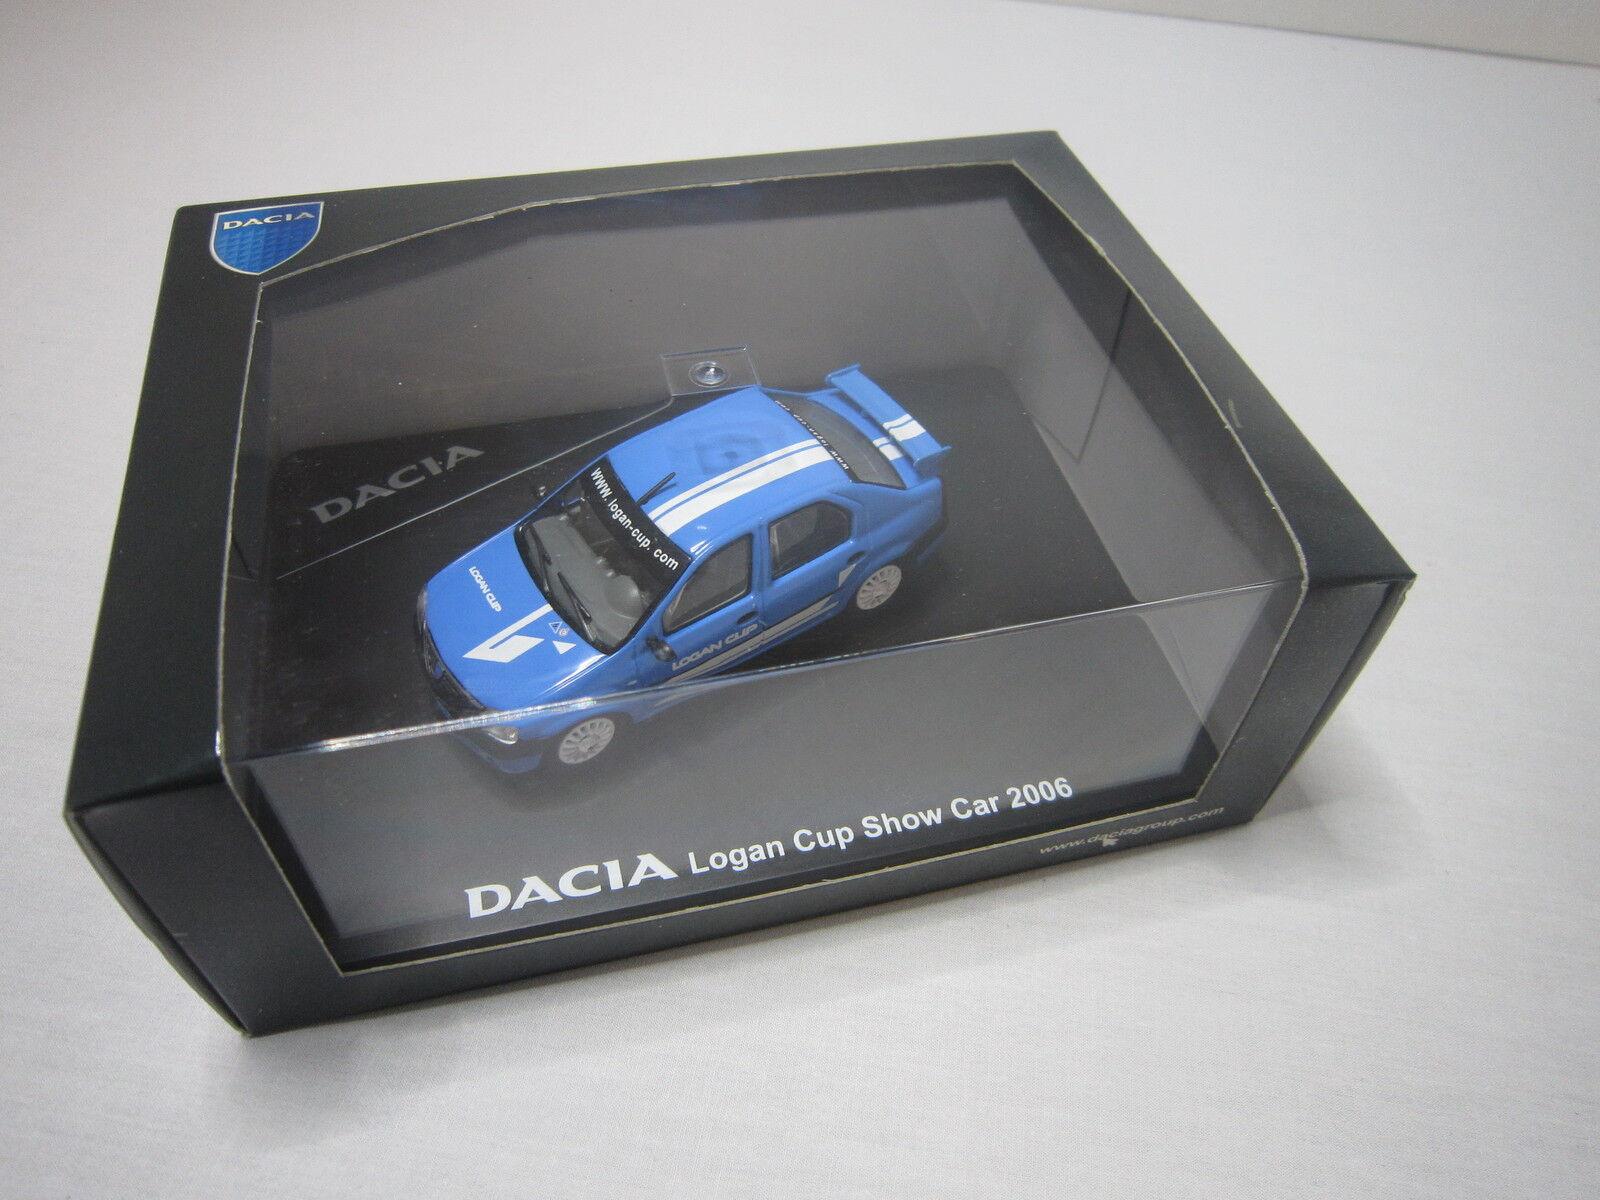 Dv6852 eligor 1 43 dacia logan cup show car 2006 ref 7711420096 etat neuf